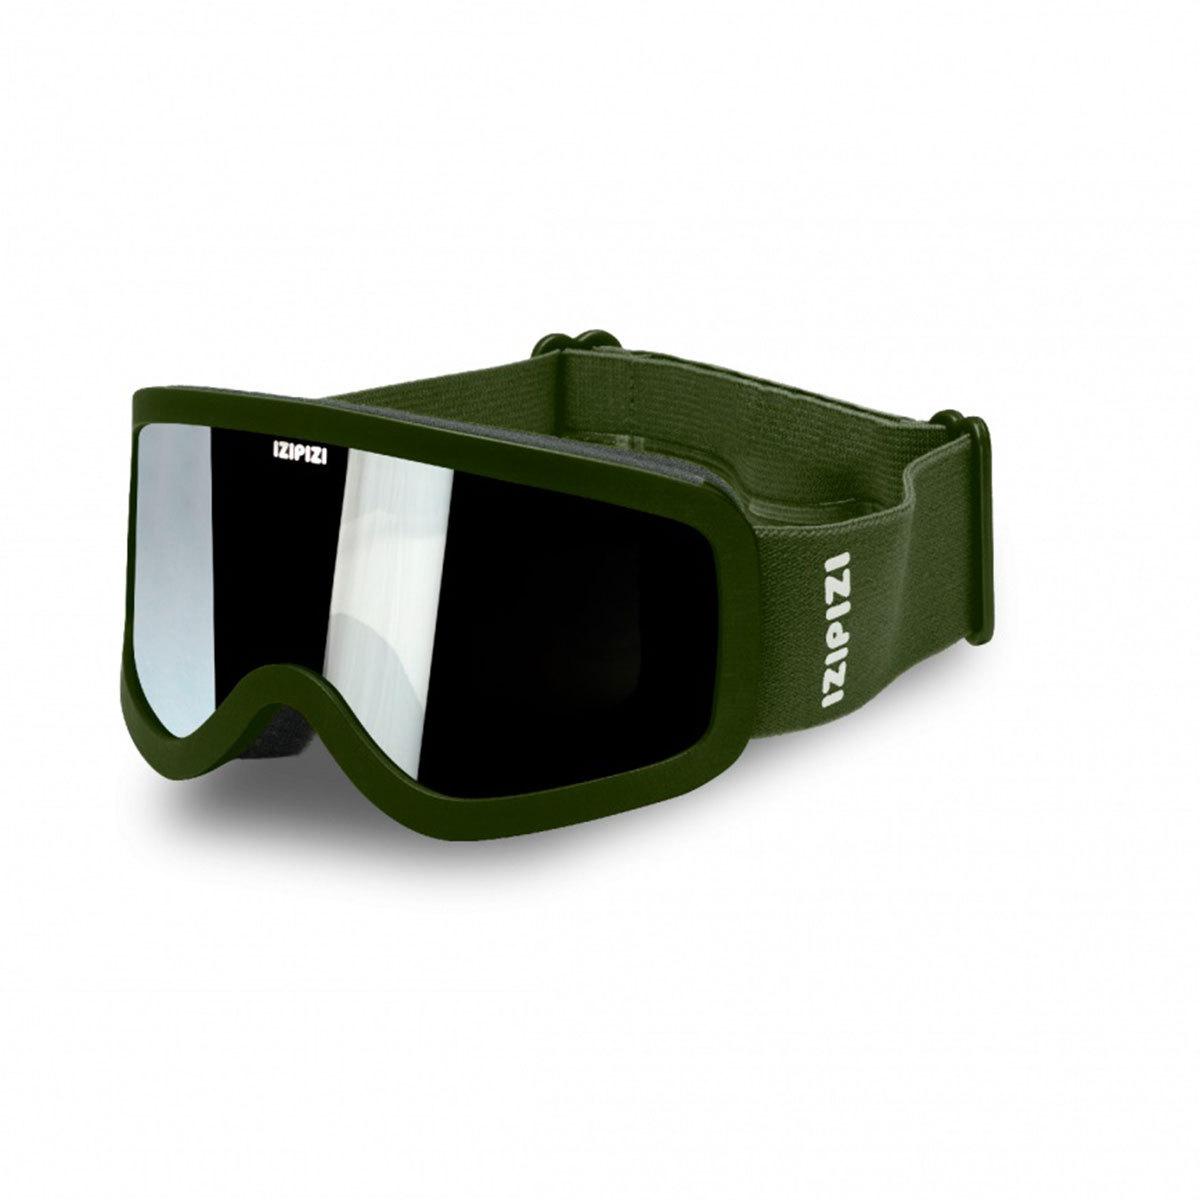 Accessoires bébé Masque de Ski Kaki Green - 4/10 Ans Masque de Ski Kaki Green - 4/10 Ans